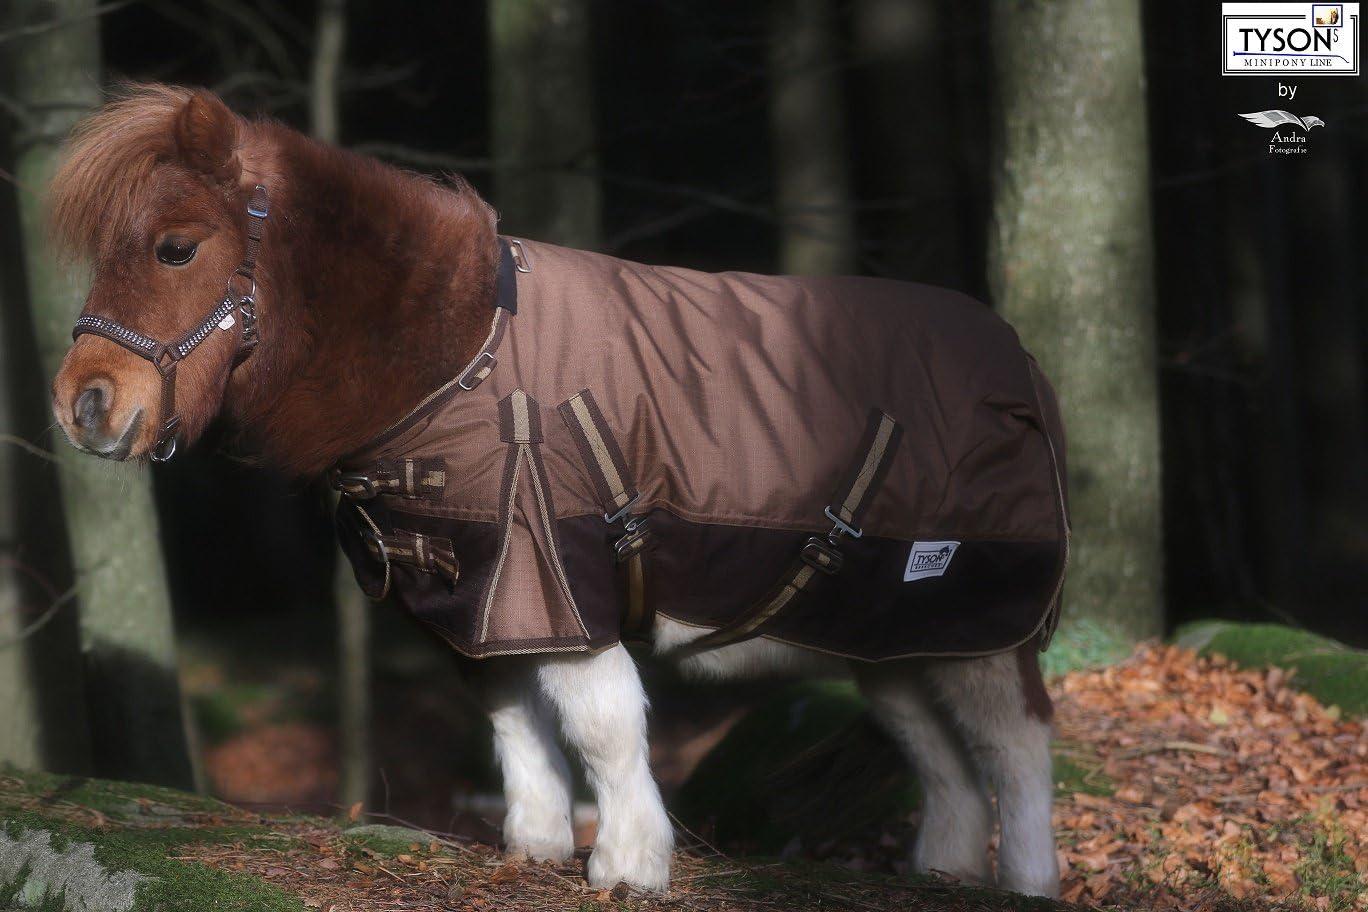 1200 D Outdoordecke Regendecke Braun ohne F/üllung Minishetty Minipony Mini Shetty 65 70 75 80 85 90 95 100 Tysons